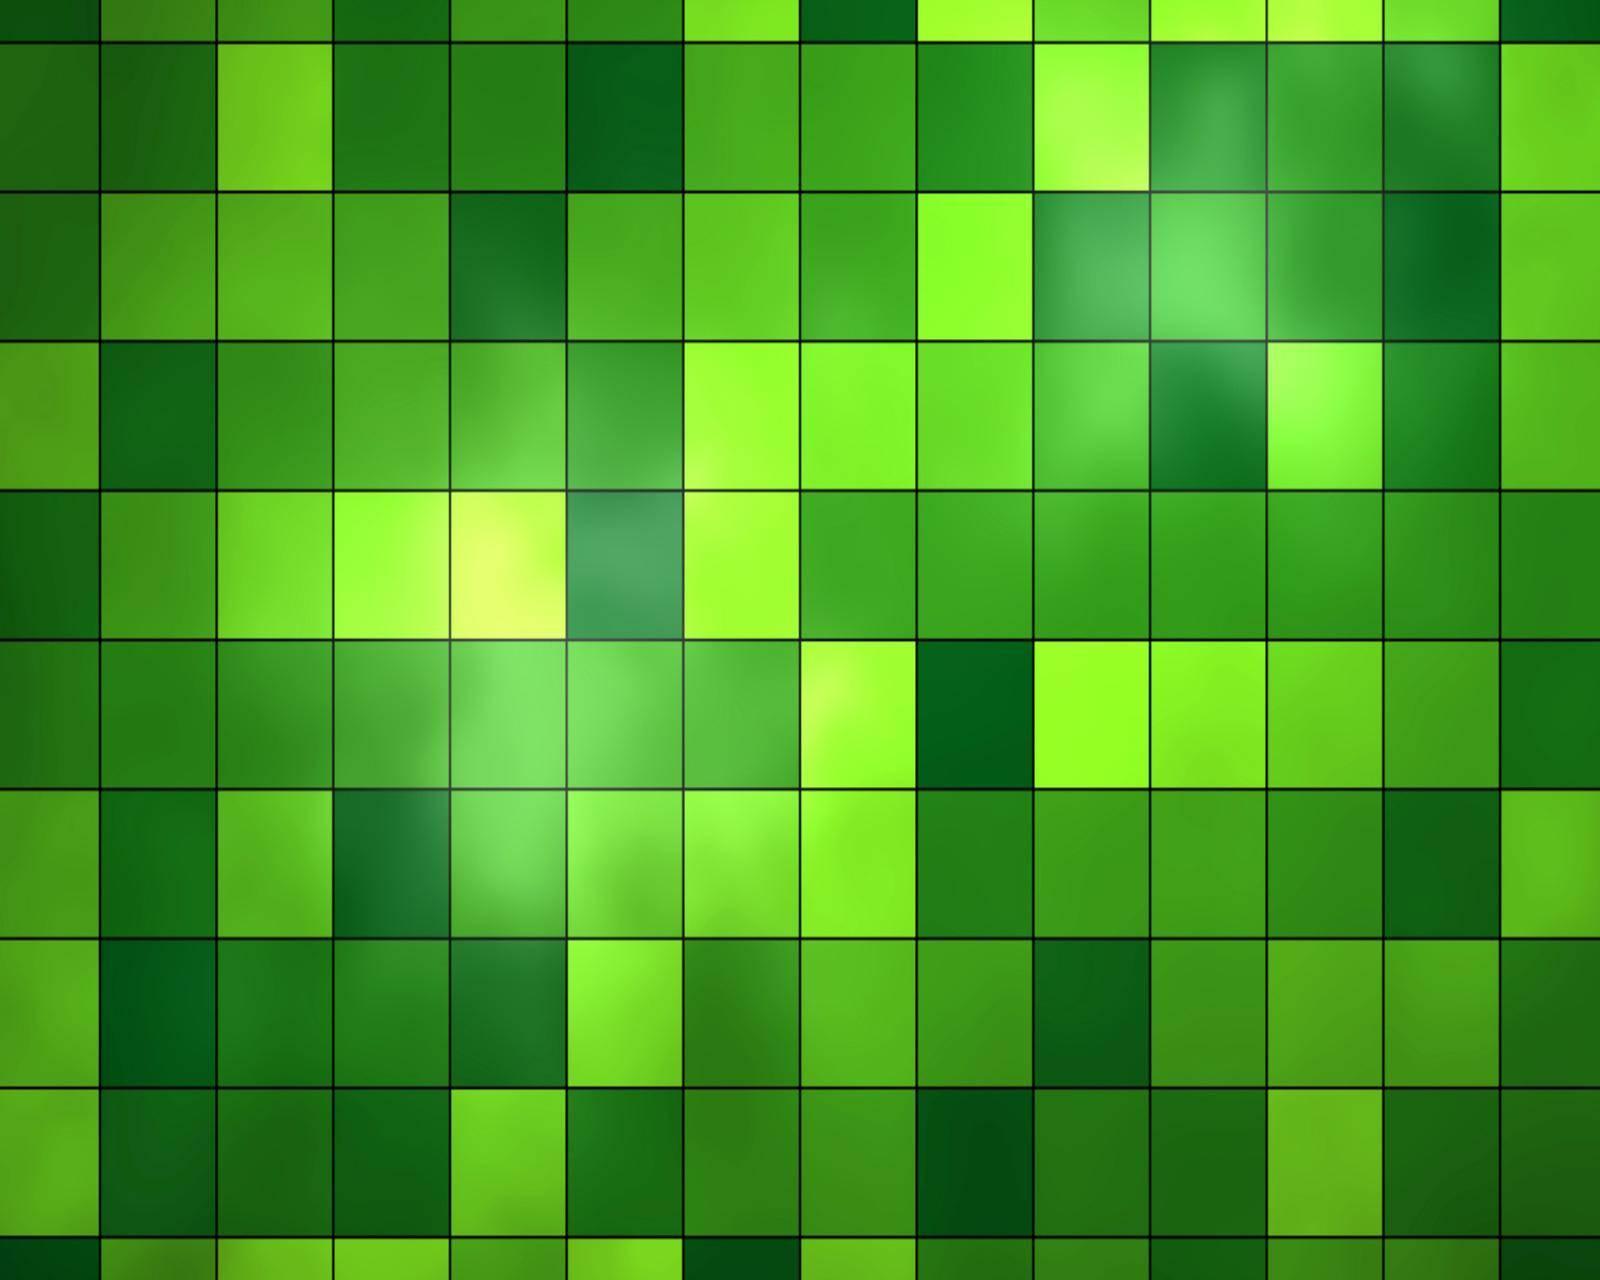 Pattern Cubes